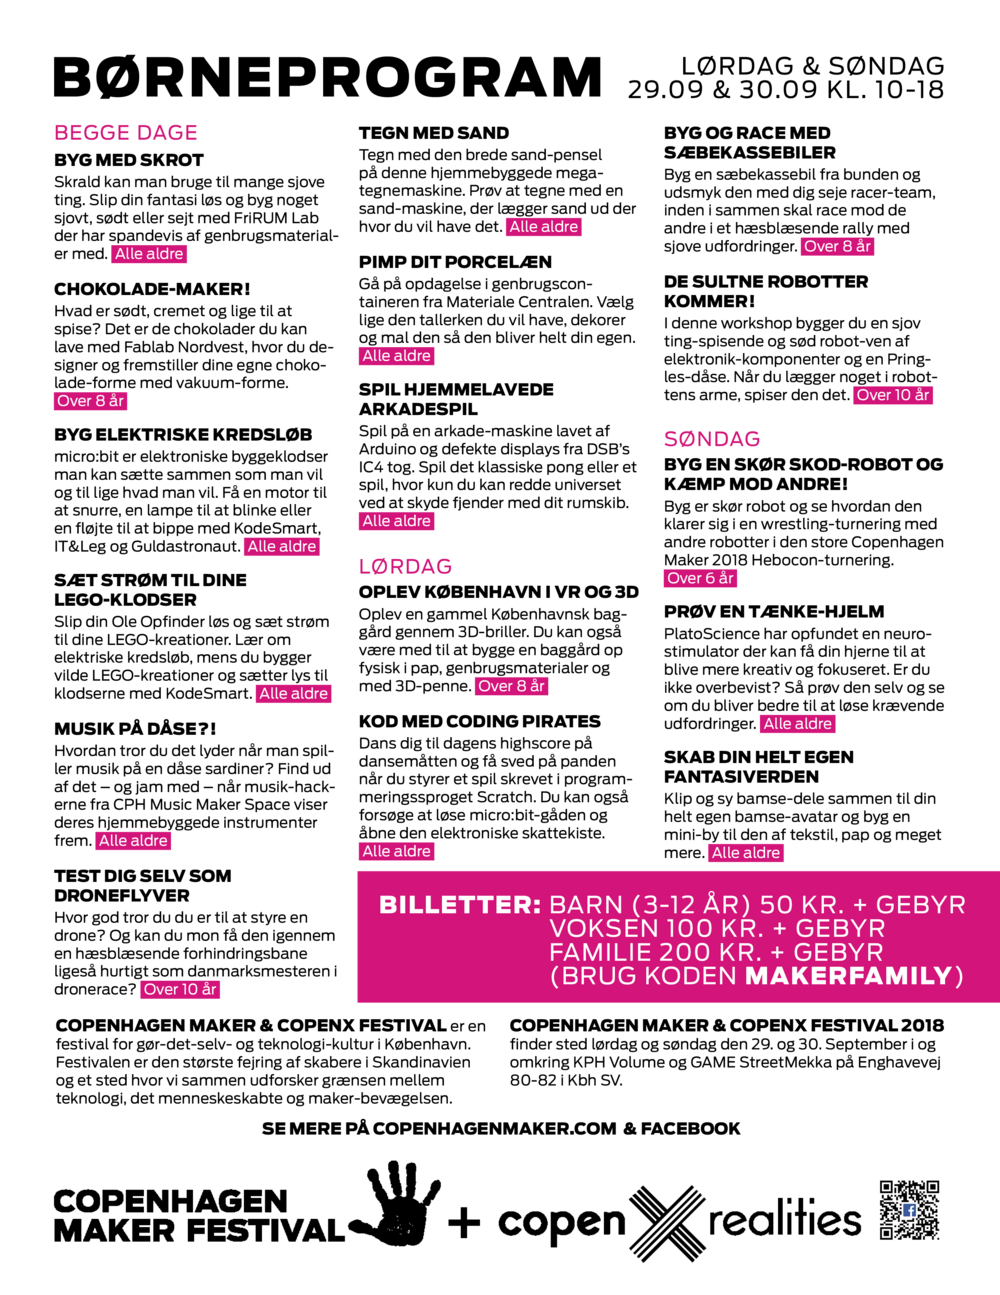 cmf2018_borneprogram.png